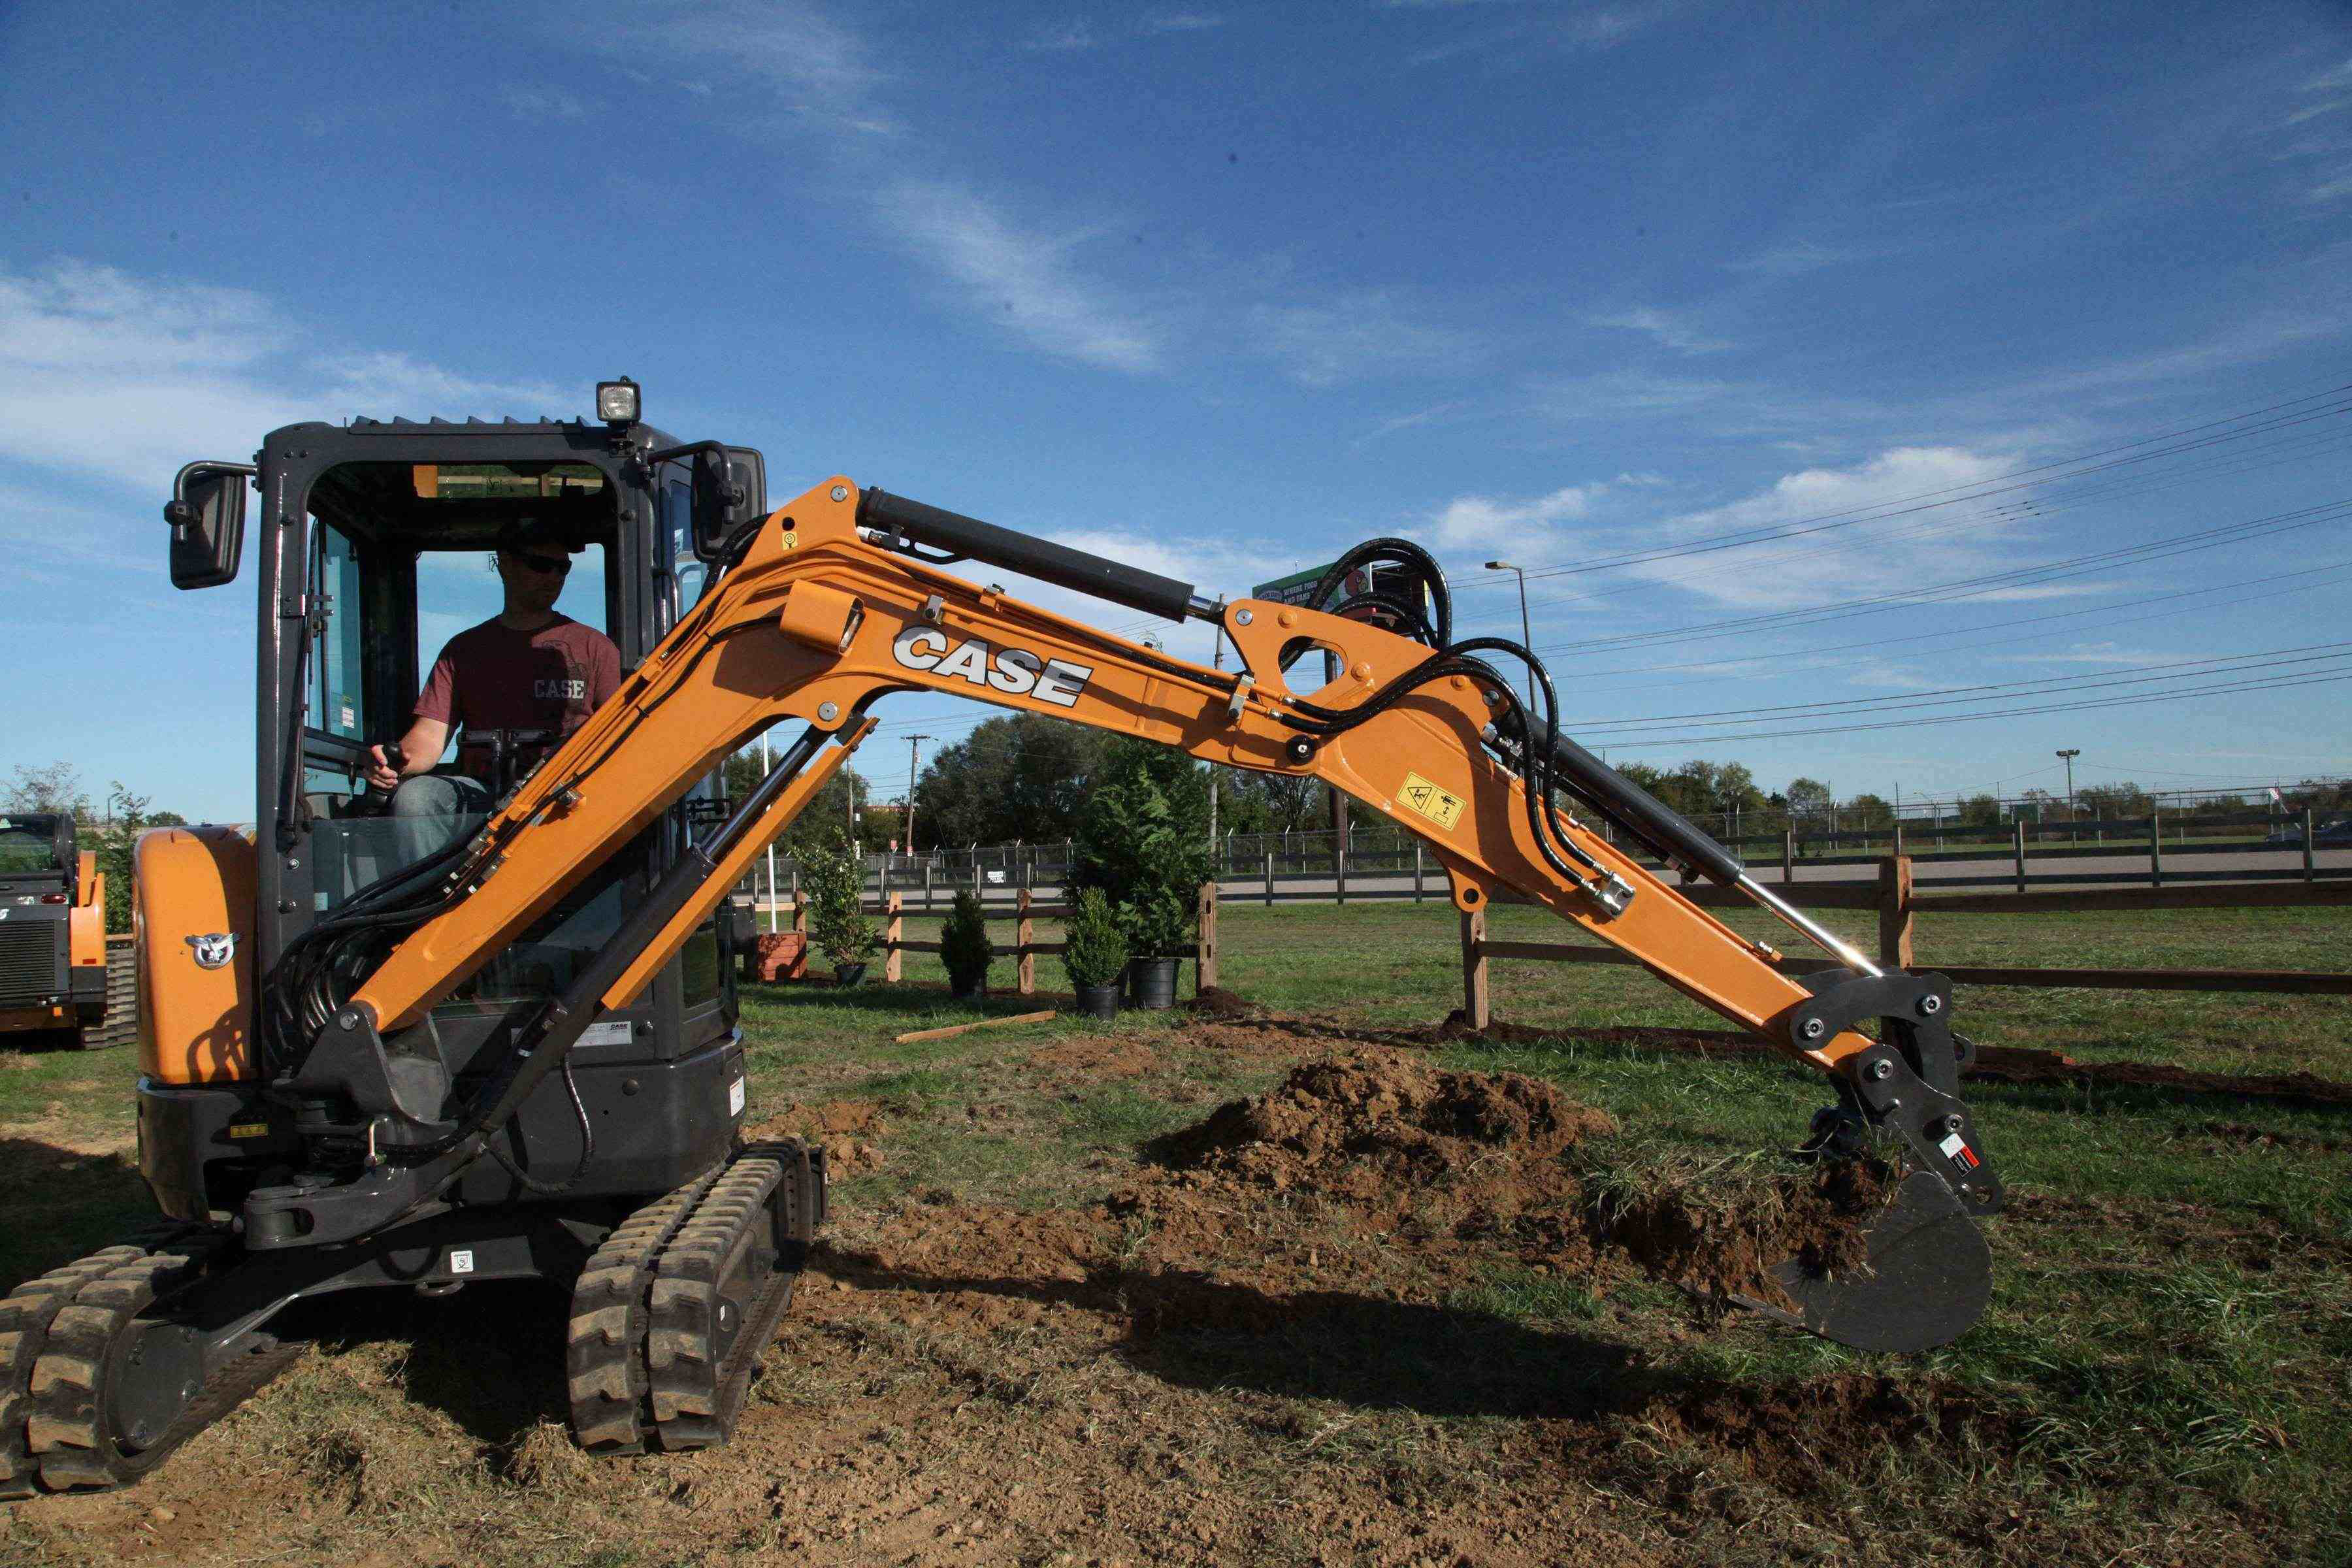 Mini Construction Equipment : Case construction equipment debuts cx c compact excavator